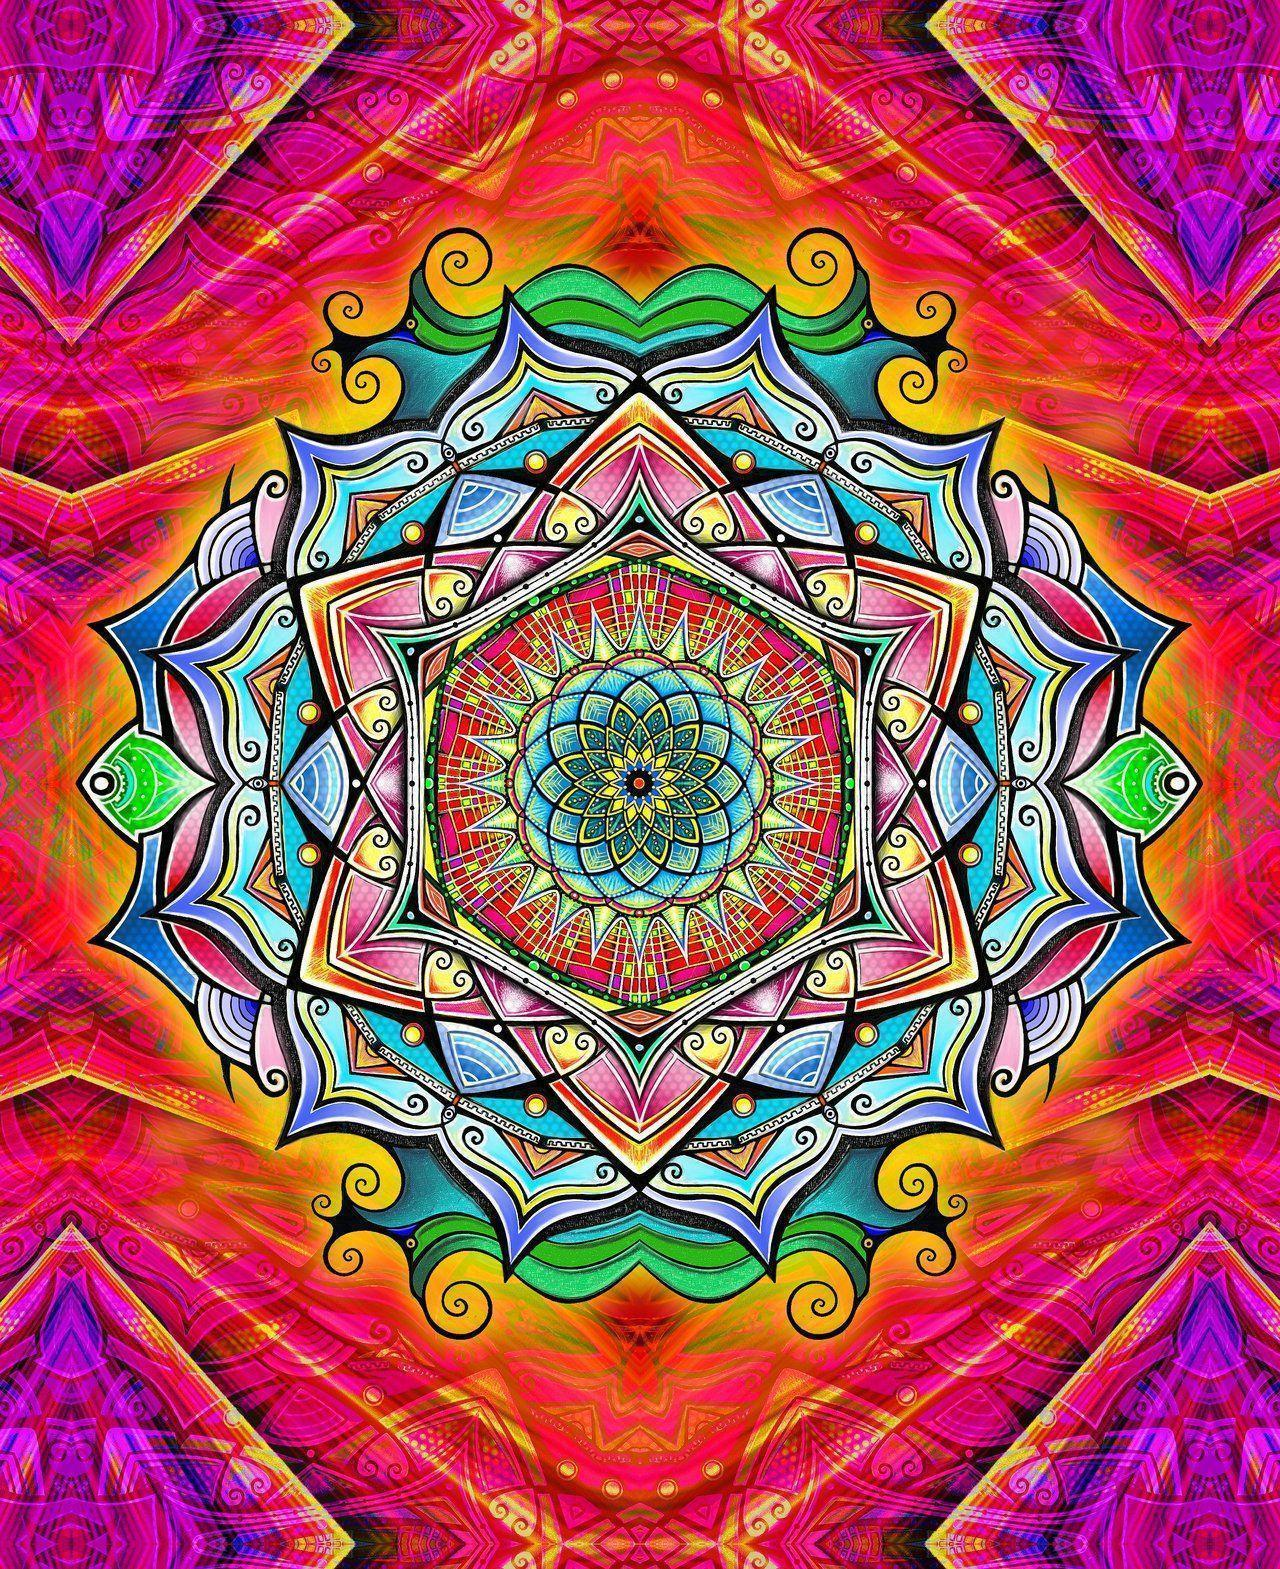 Mandala Wallpaper HD - WallpaperSafari